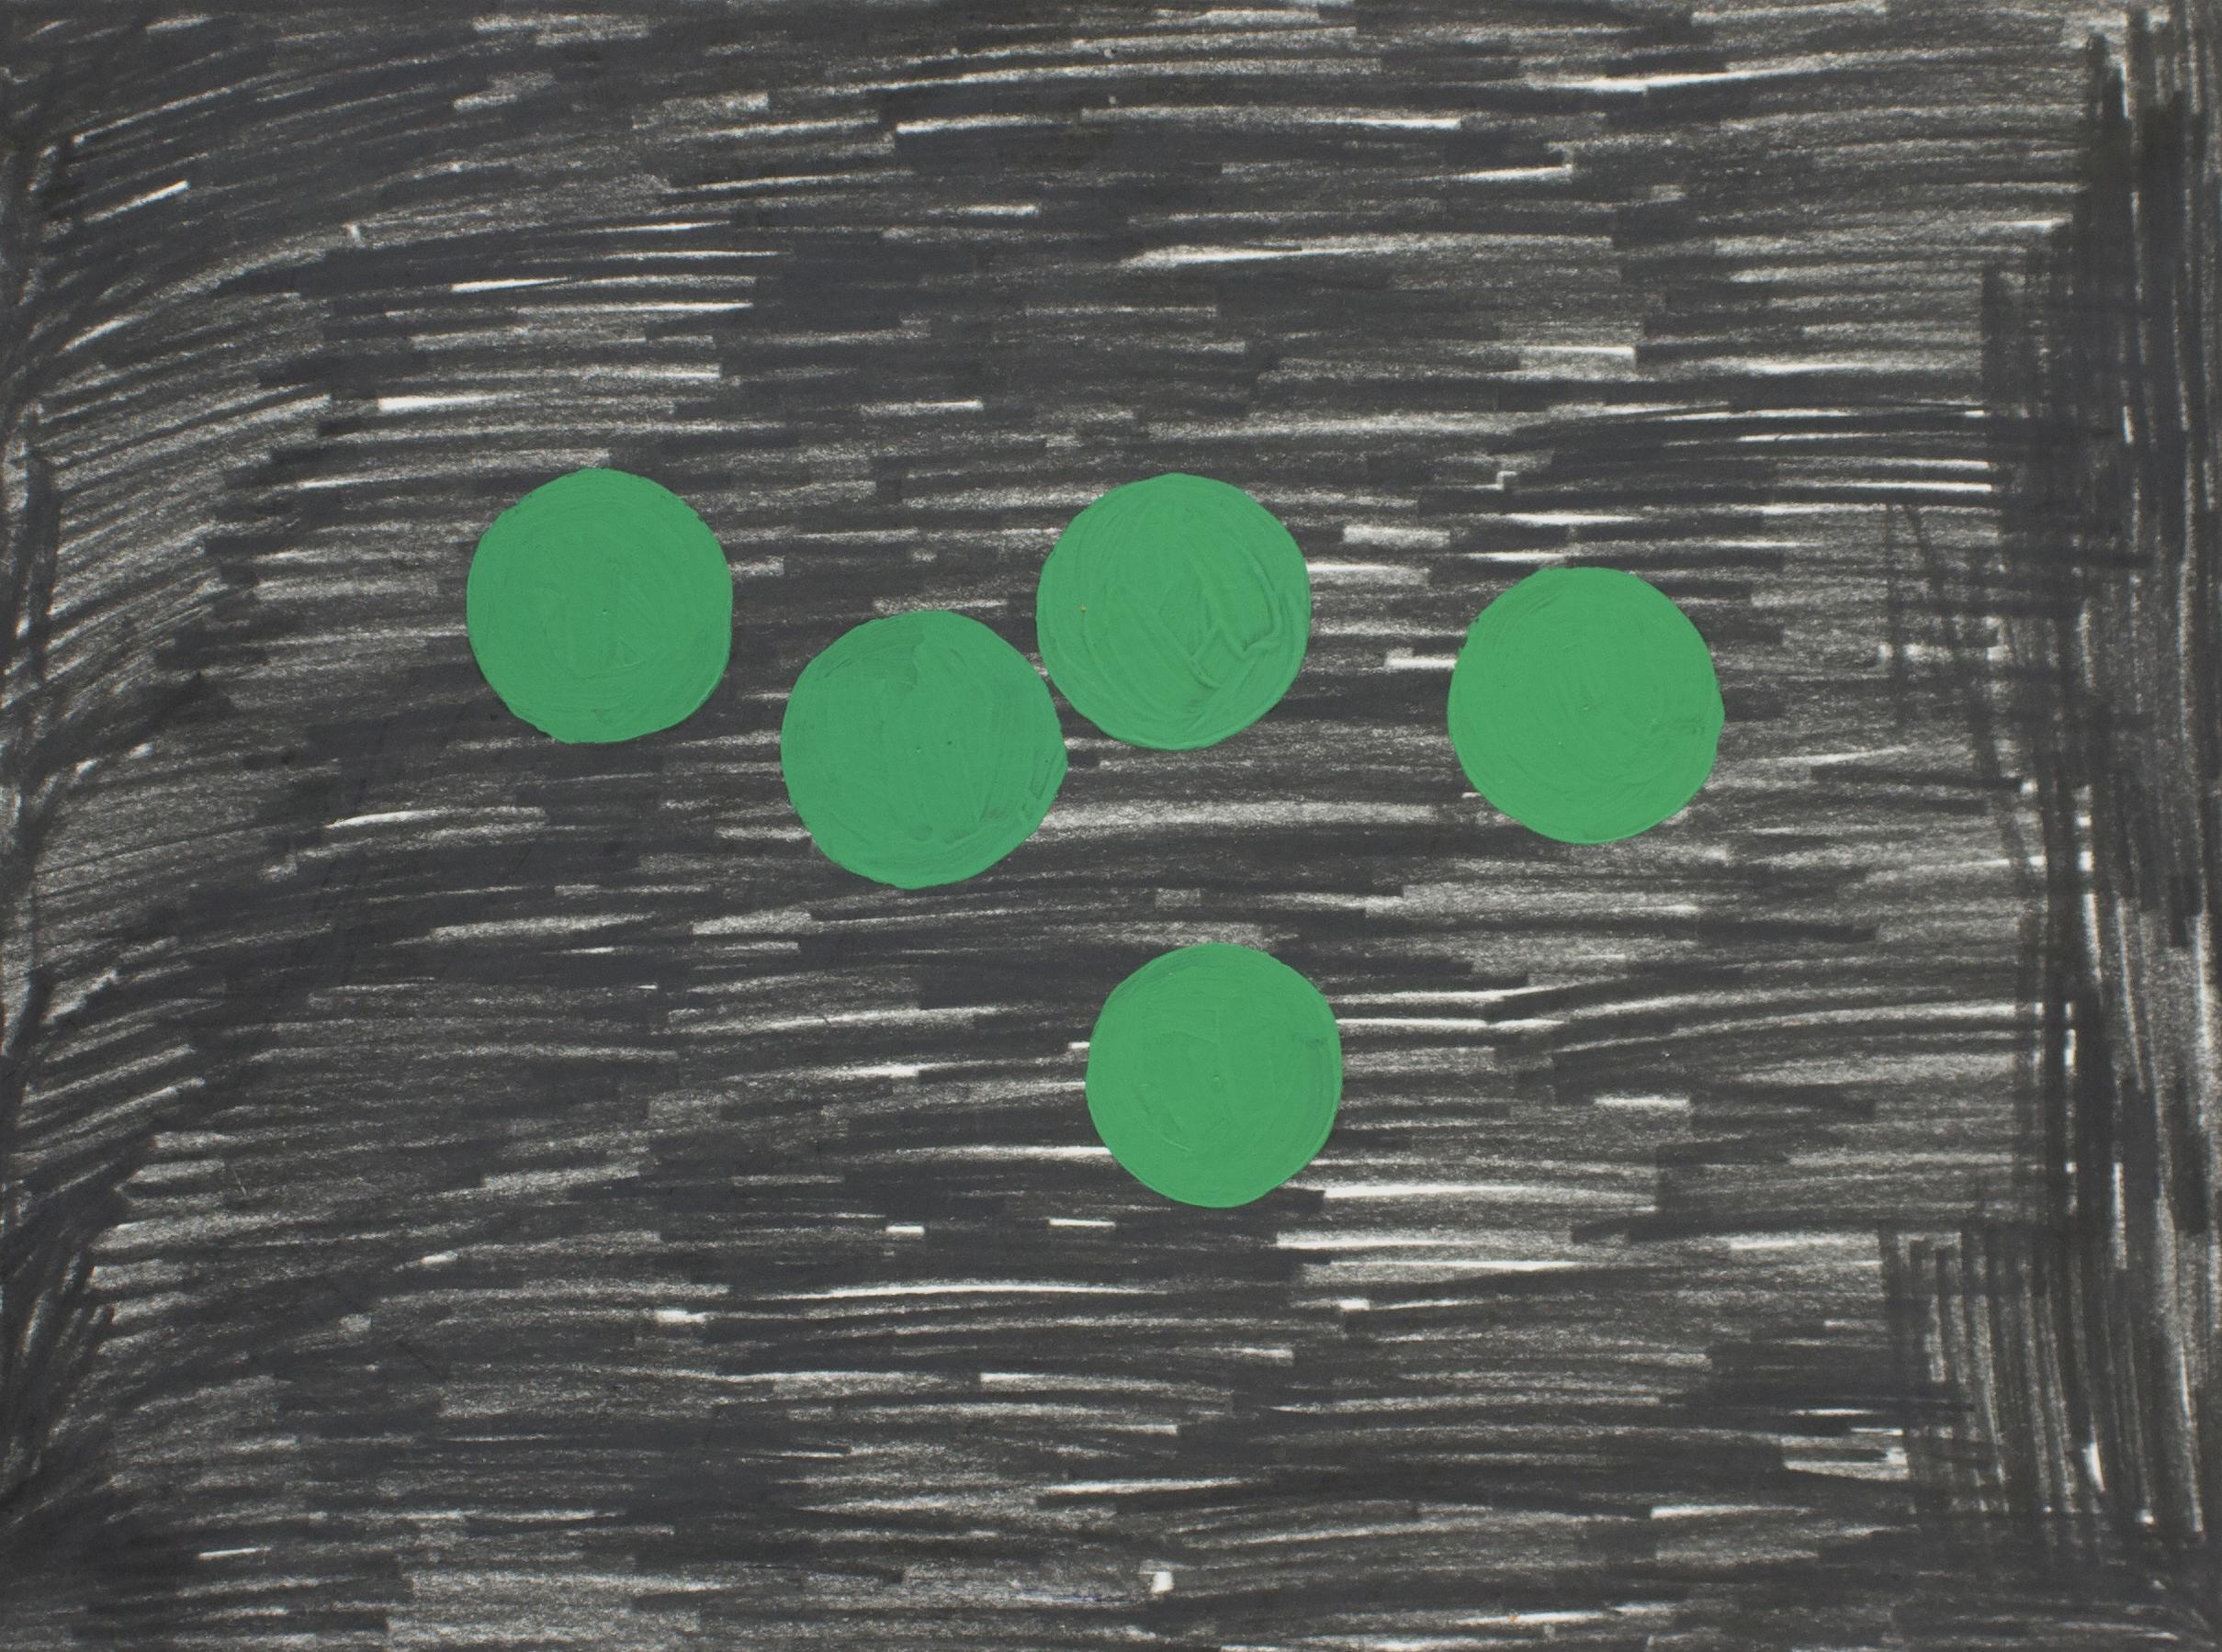 Green_circles.jpg